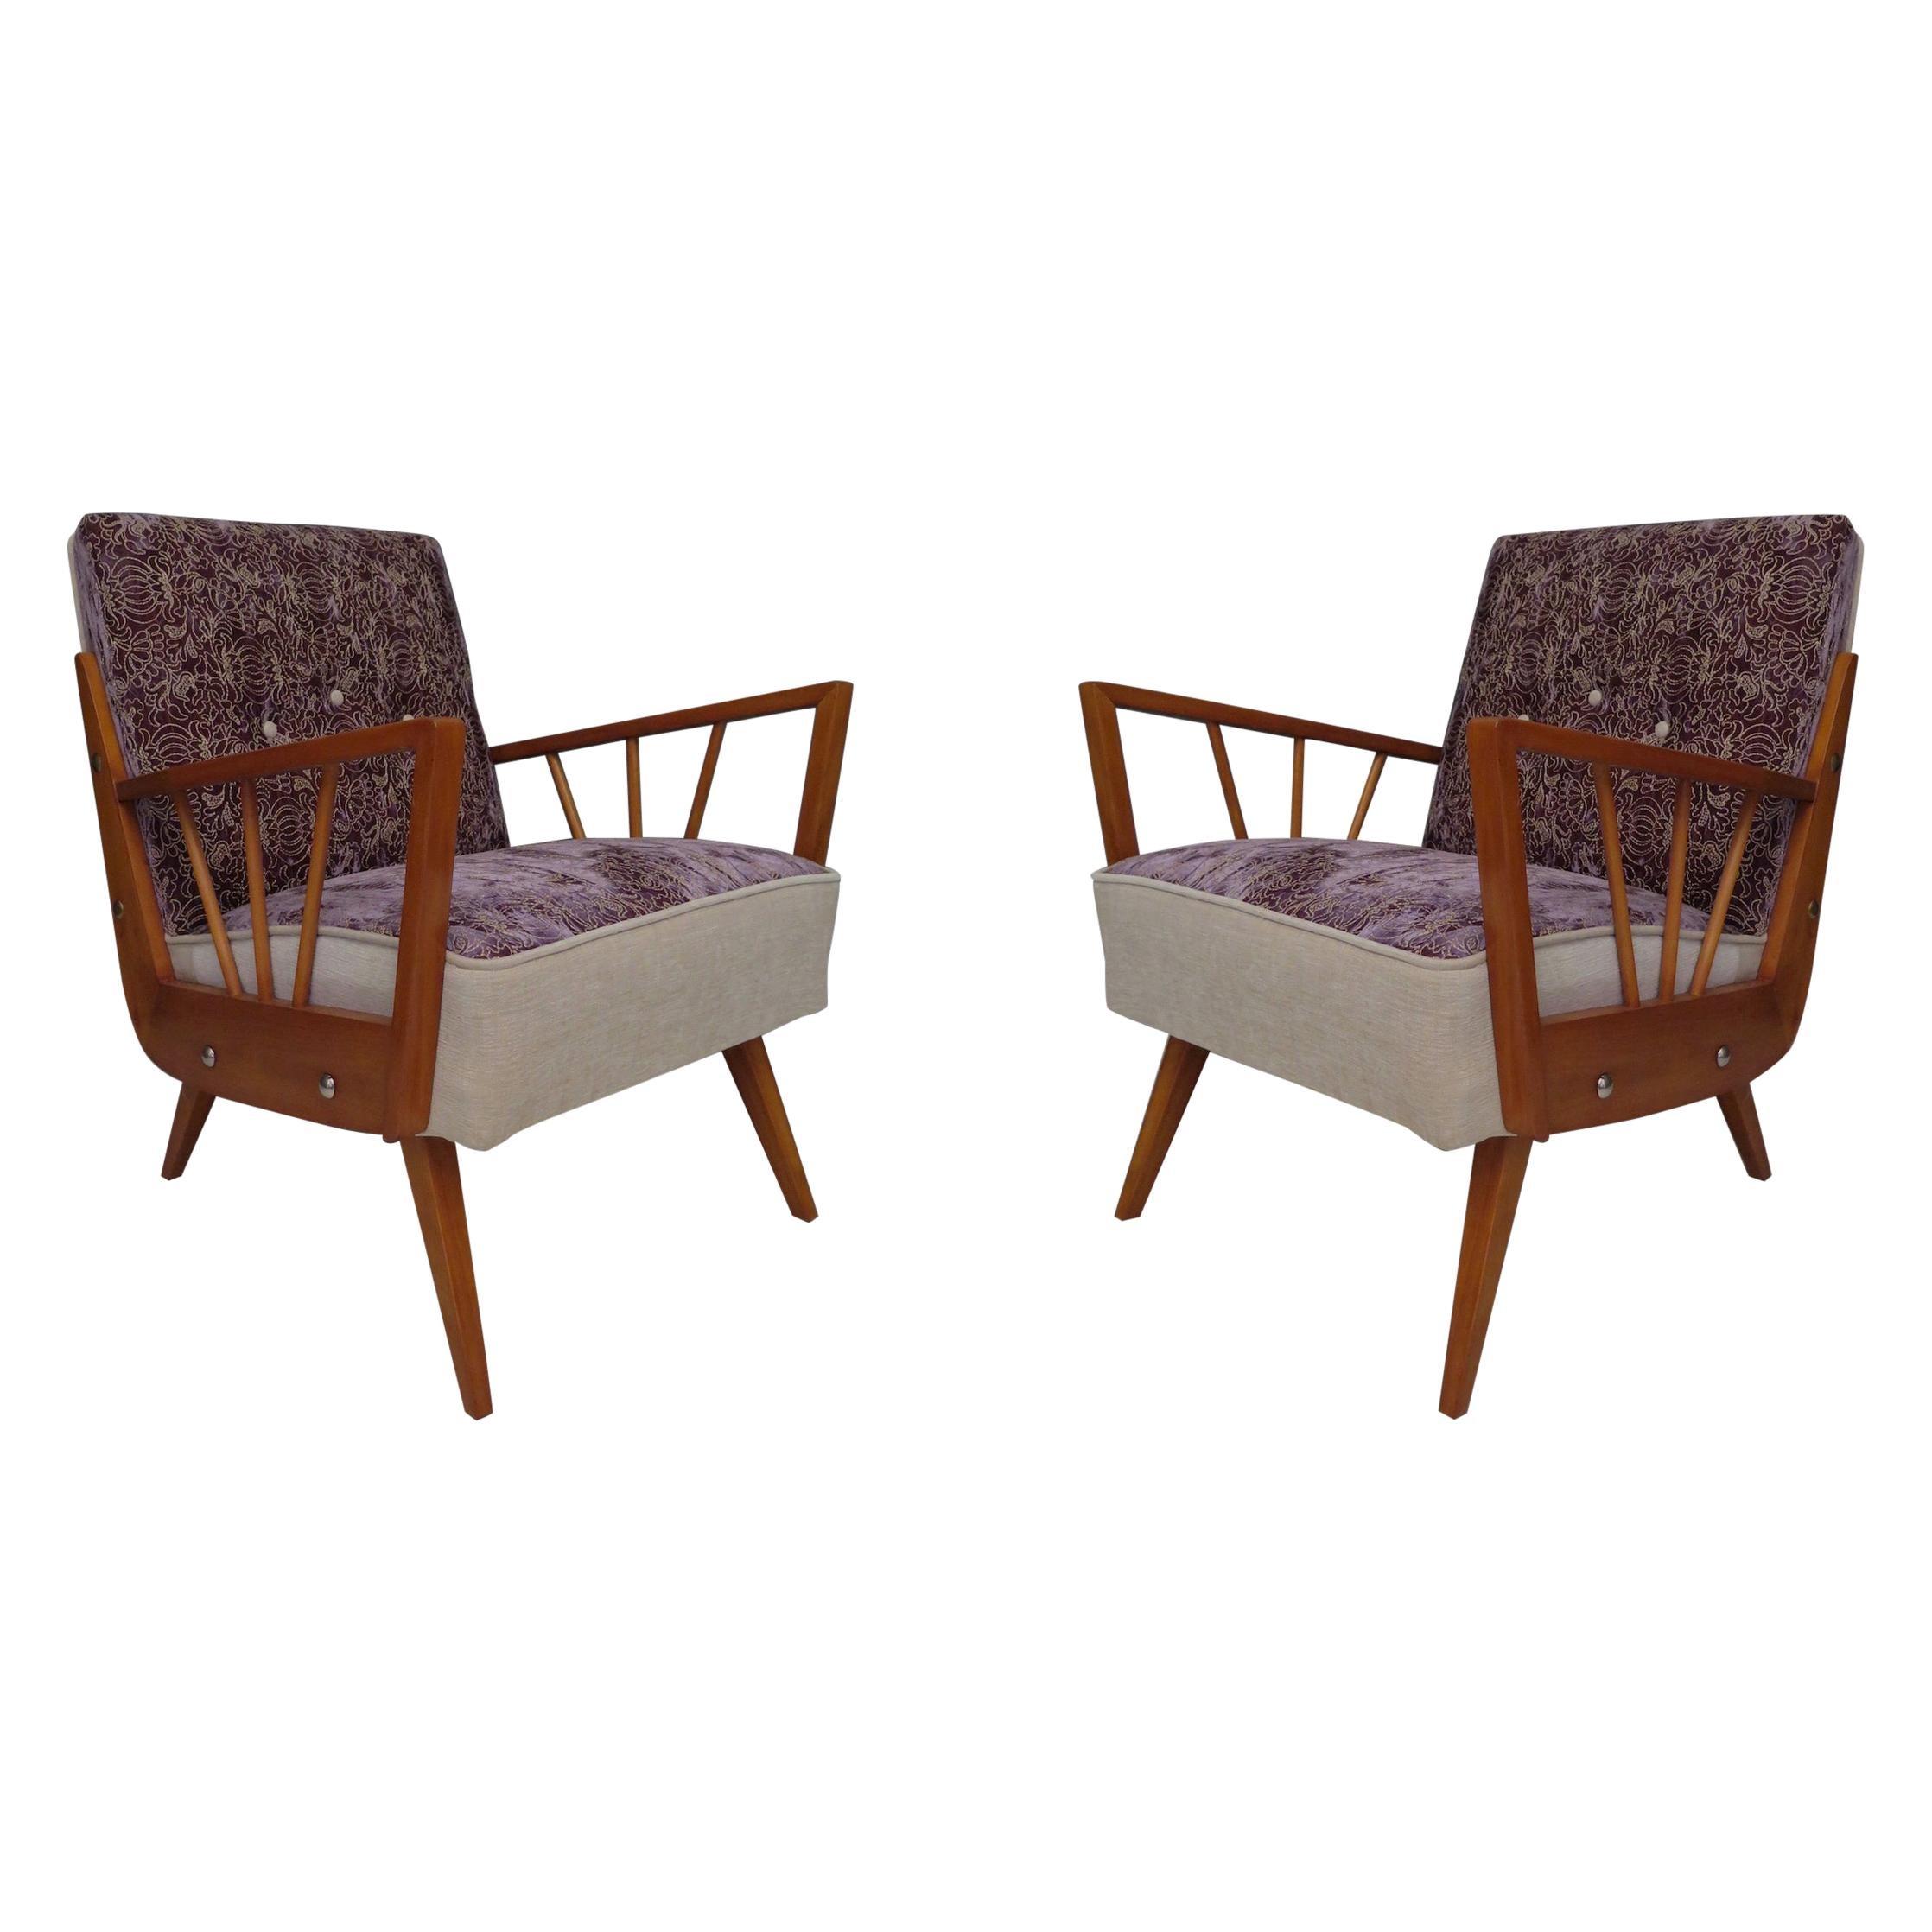 Midcentury Embroidered Velvet and Light Wood Italian Armchairs, 1950